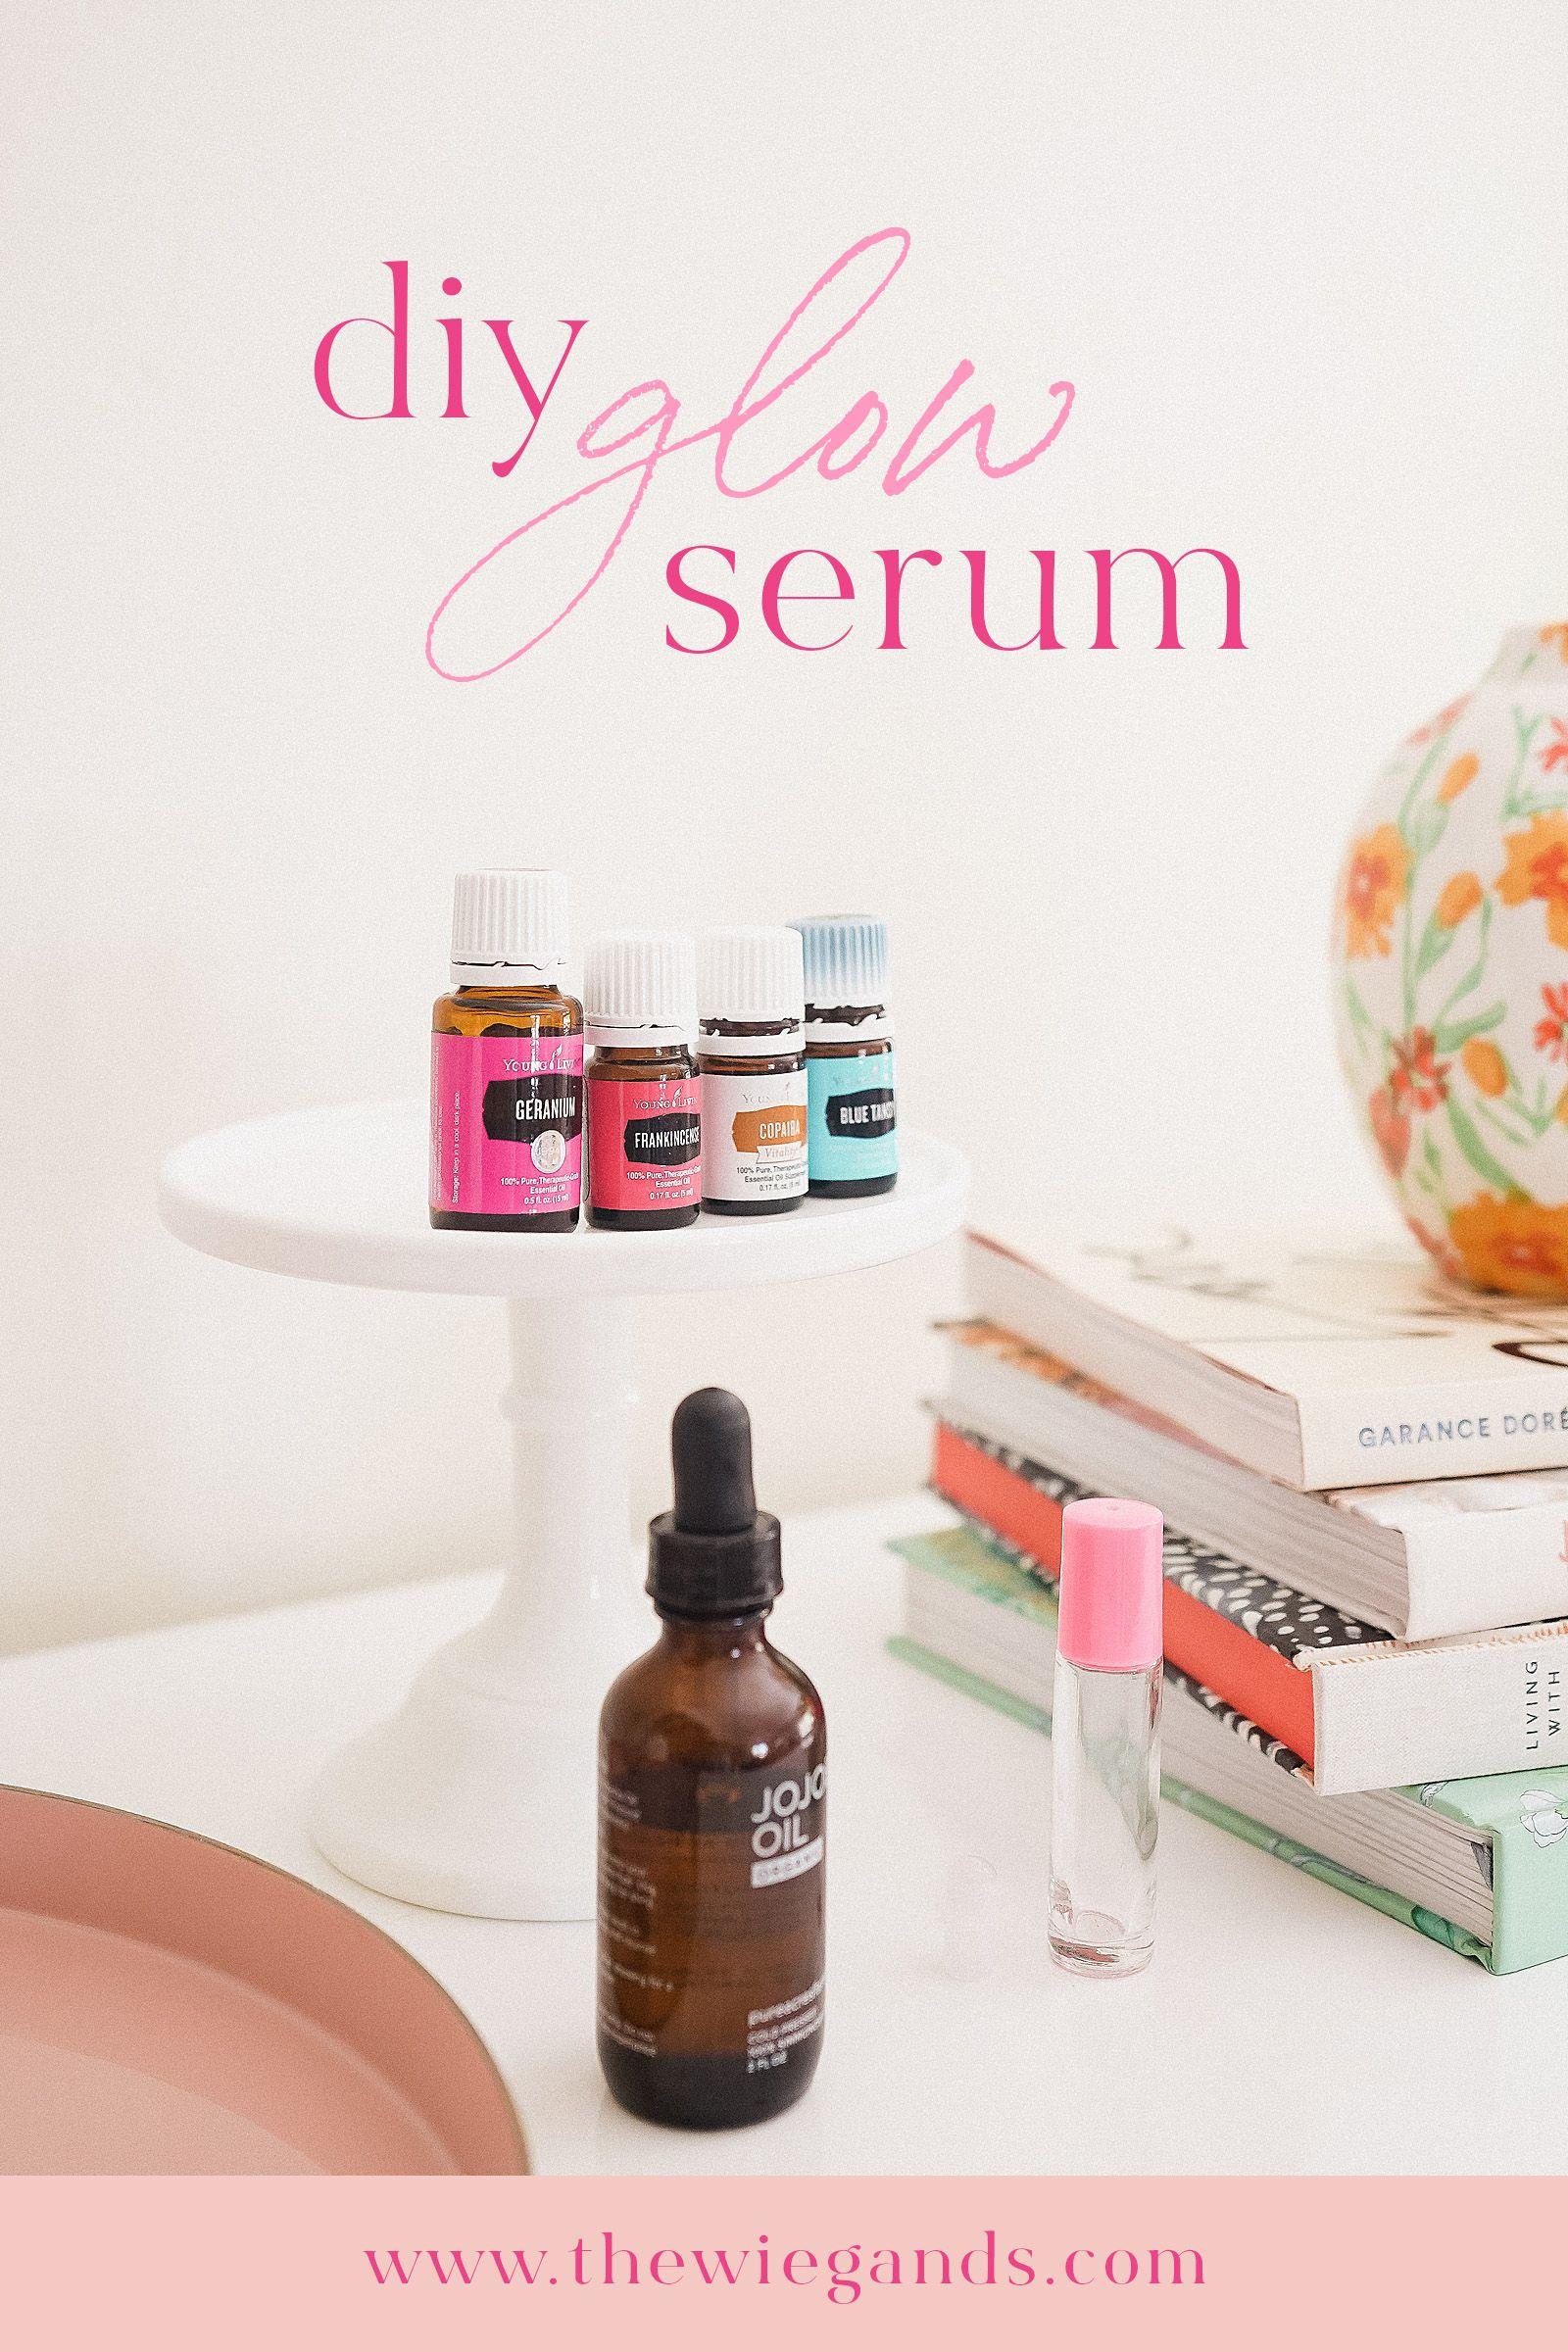 DIY Glow Serum with Essential Oils Recipe Diy serum